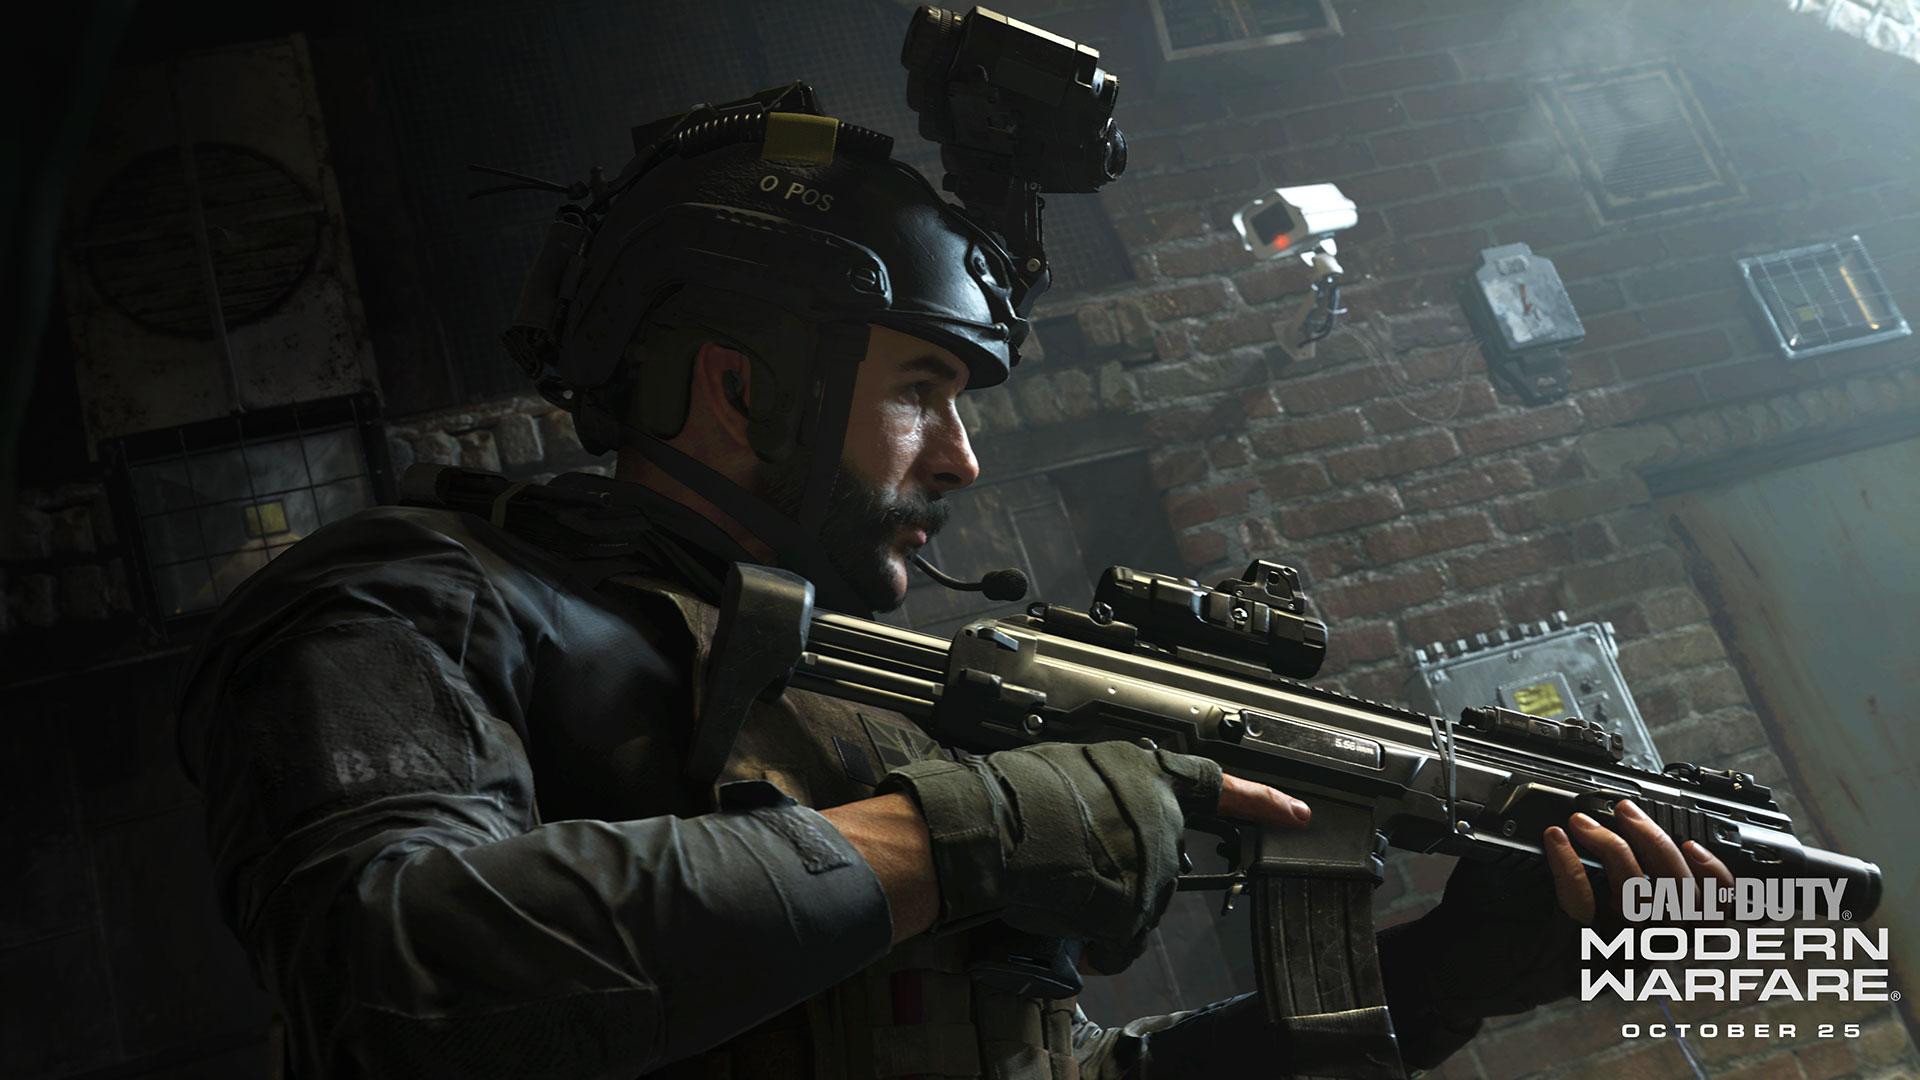 Call of Duty: Modern Warfare' Gameplay Make a Big Change to